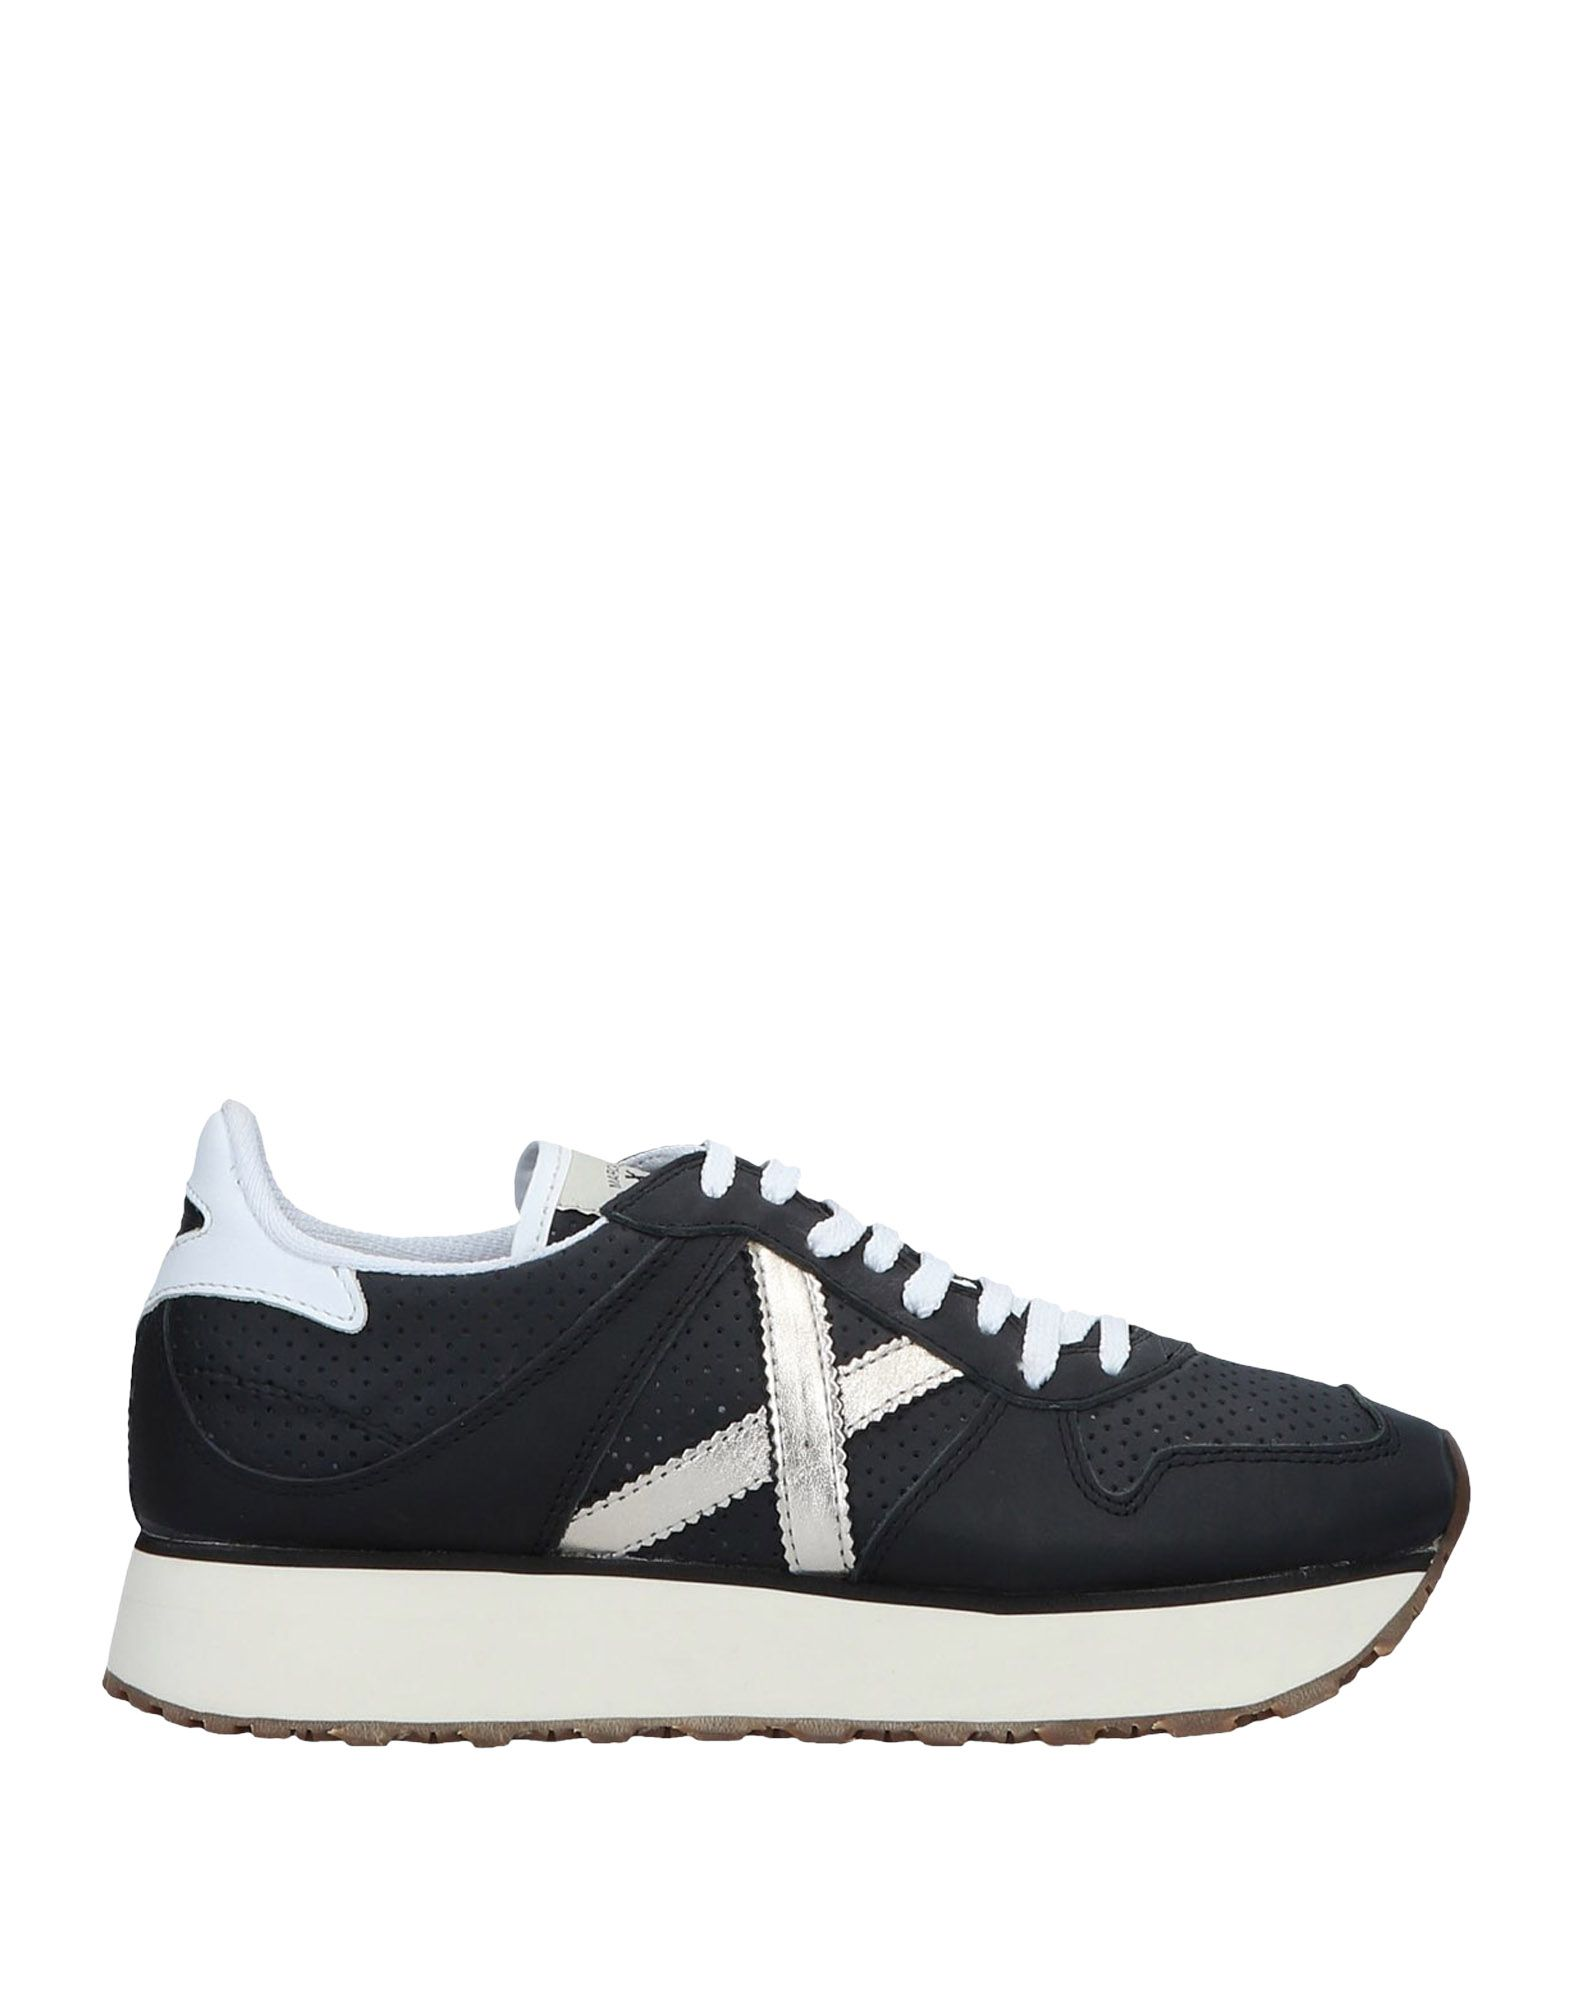 Moda Sneakers Munich Donna - 11505993DL